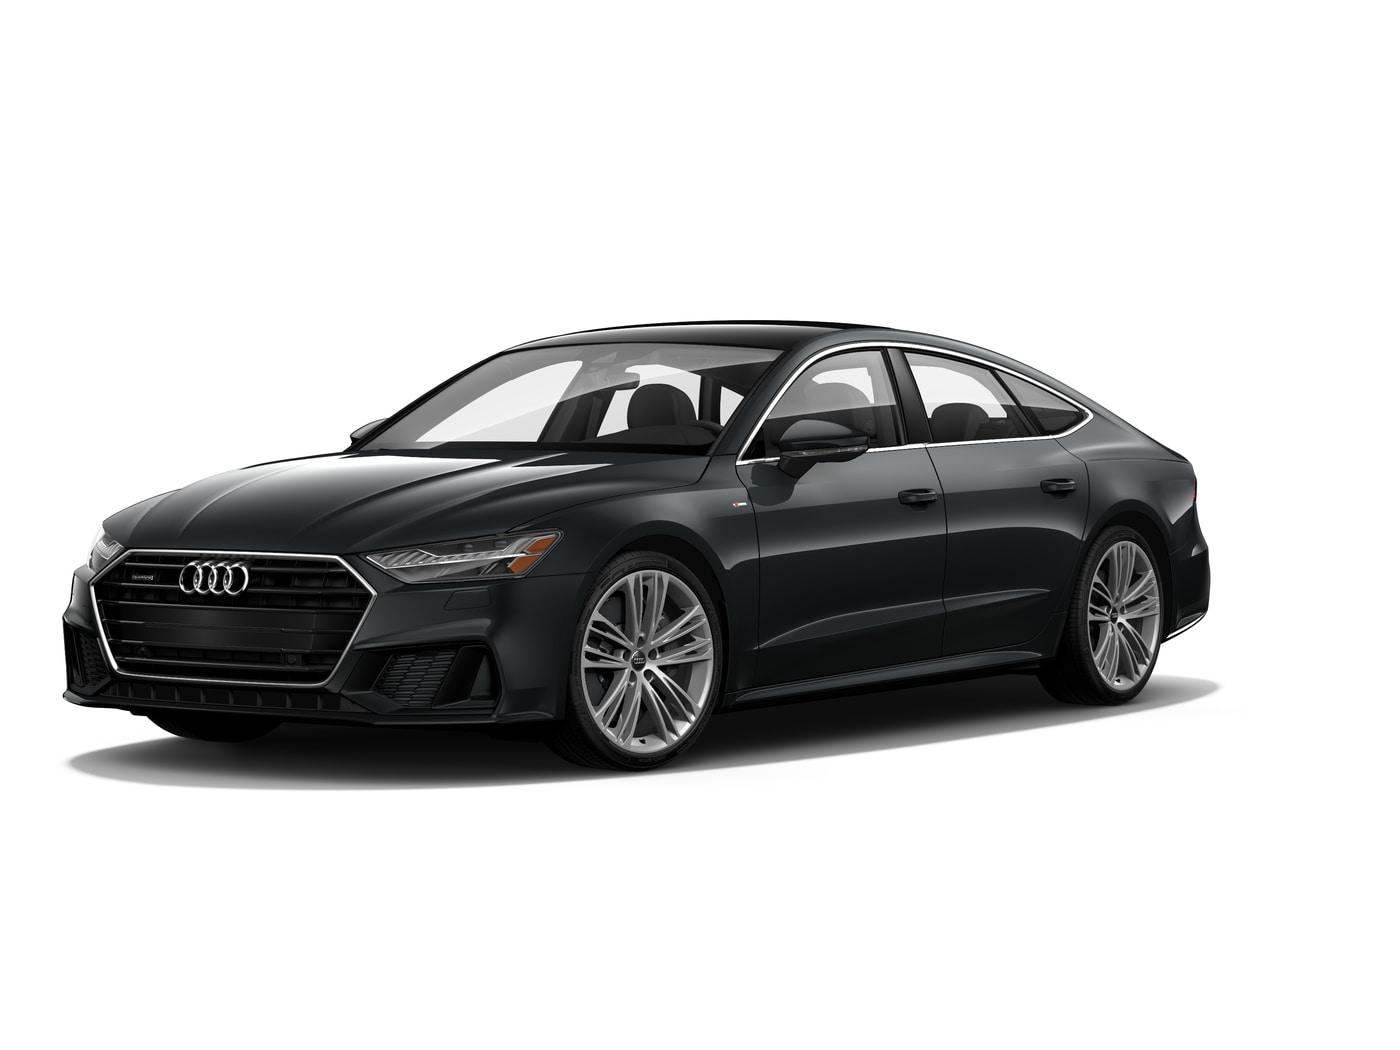 2019 Audi A7 3.0 TFSI Premium Plus